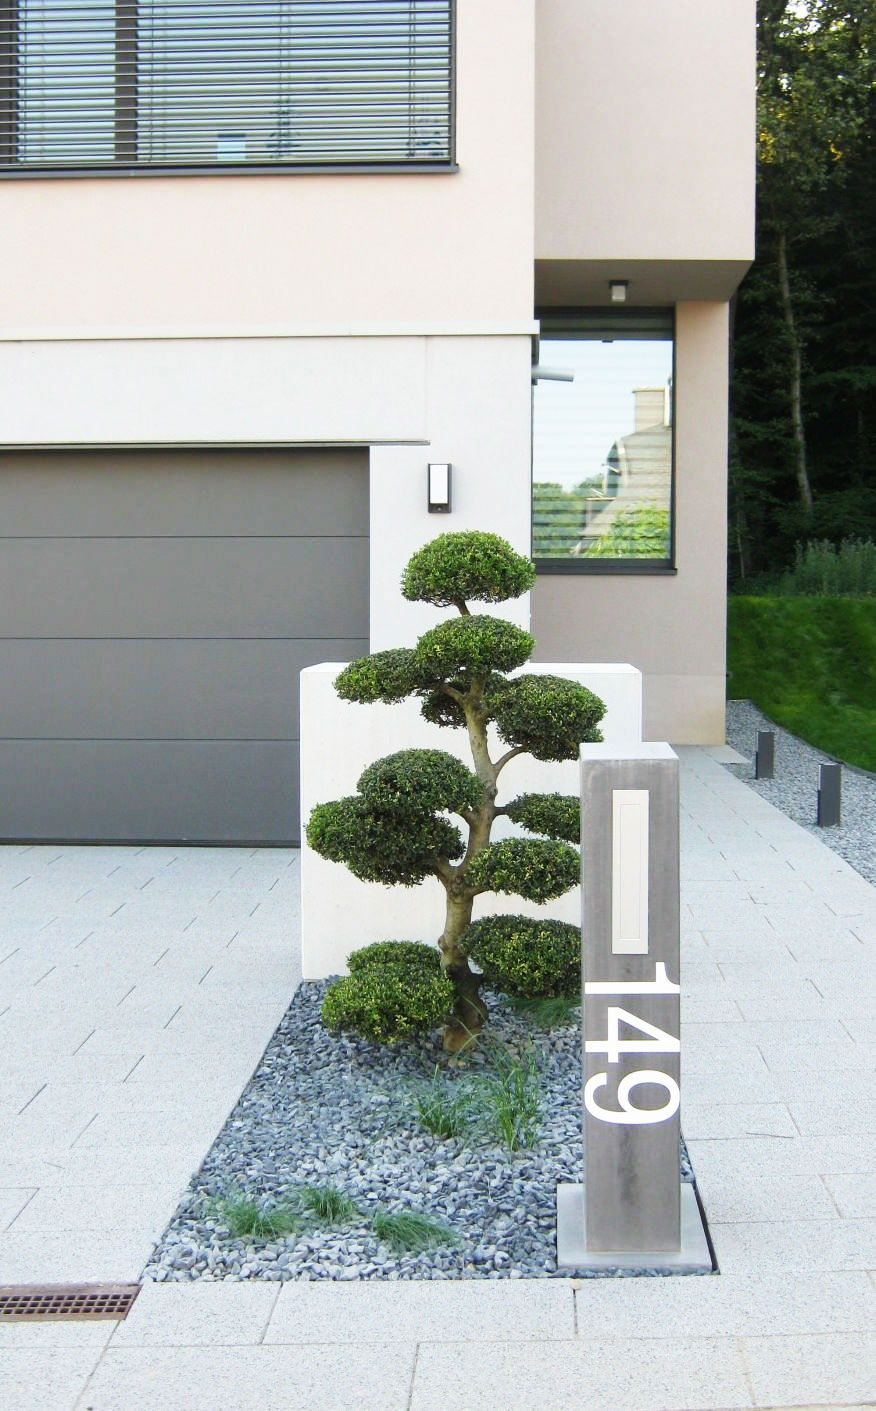 Amenagement entr e bonsa jardin et for t for Minimalistischer vorgarten